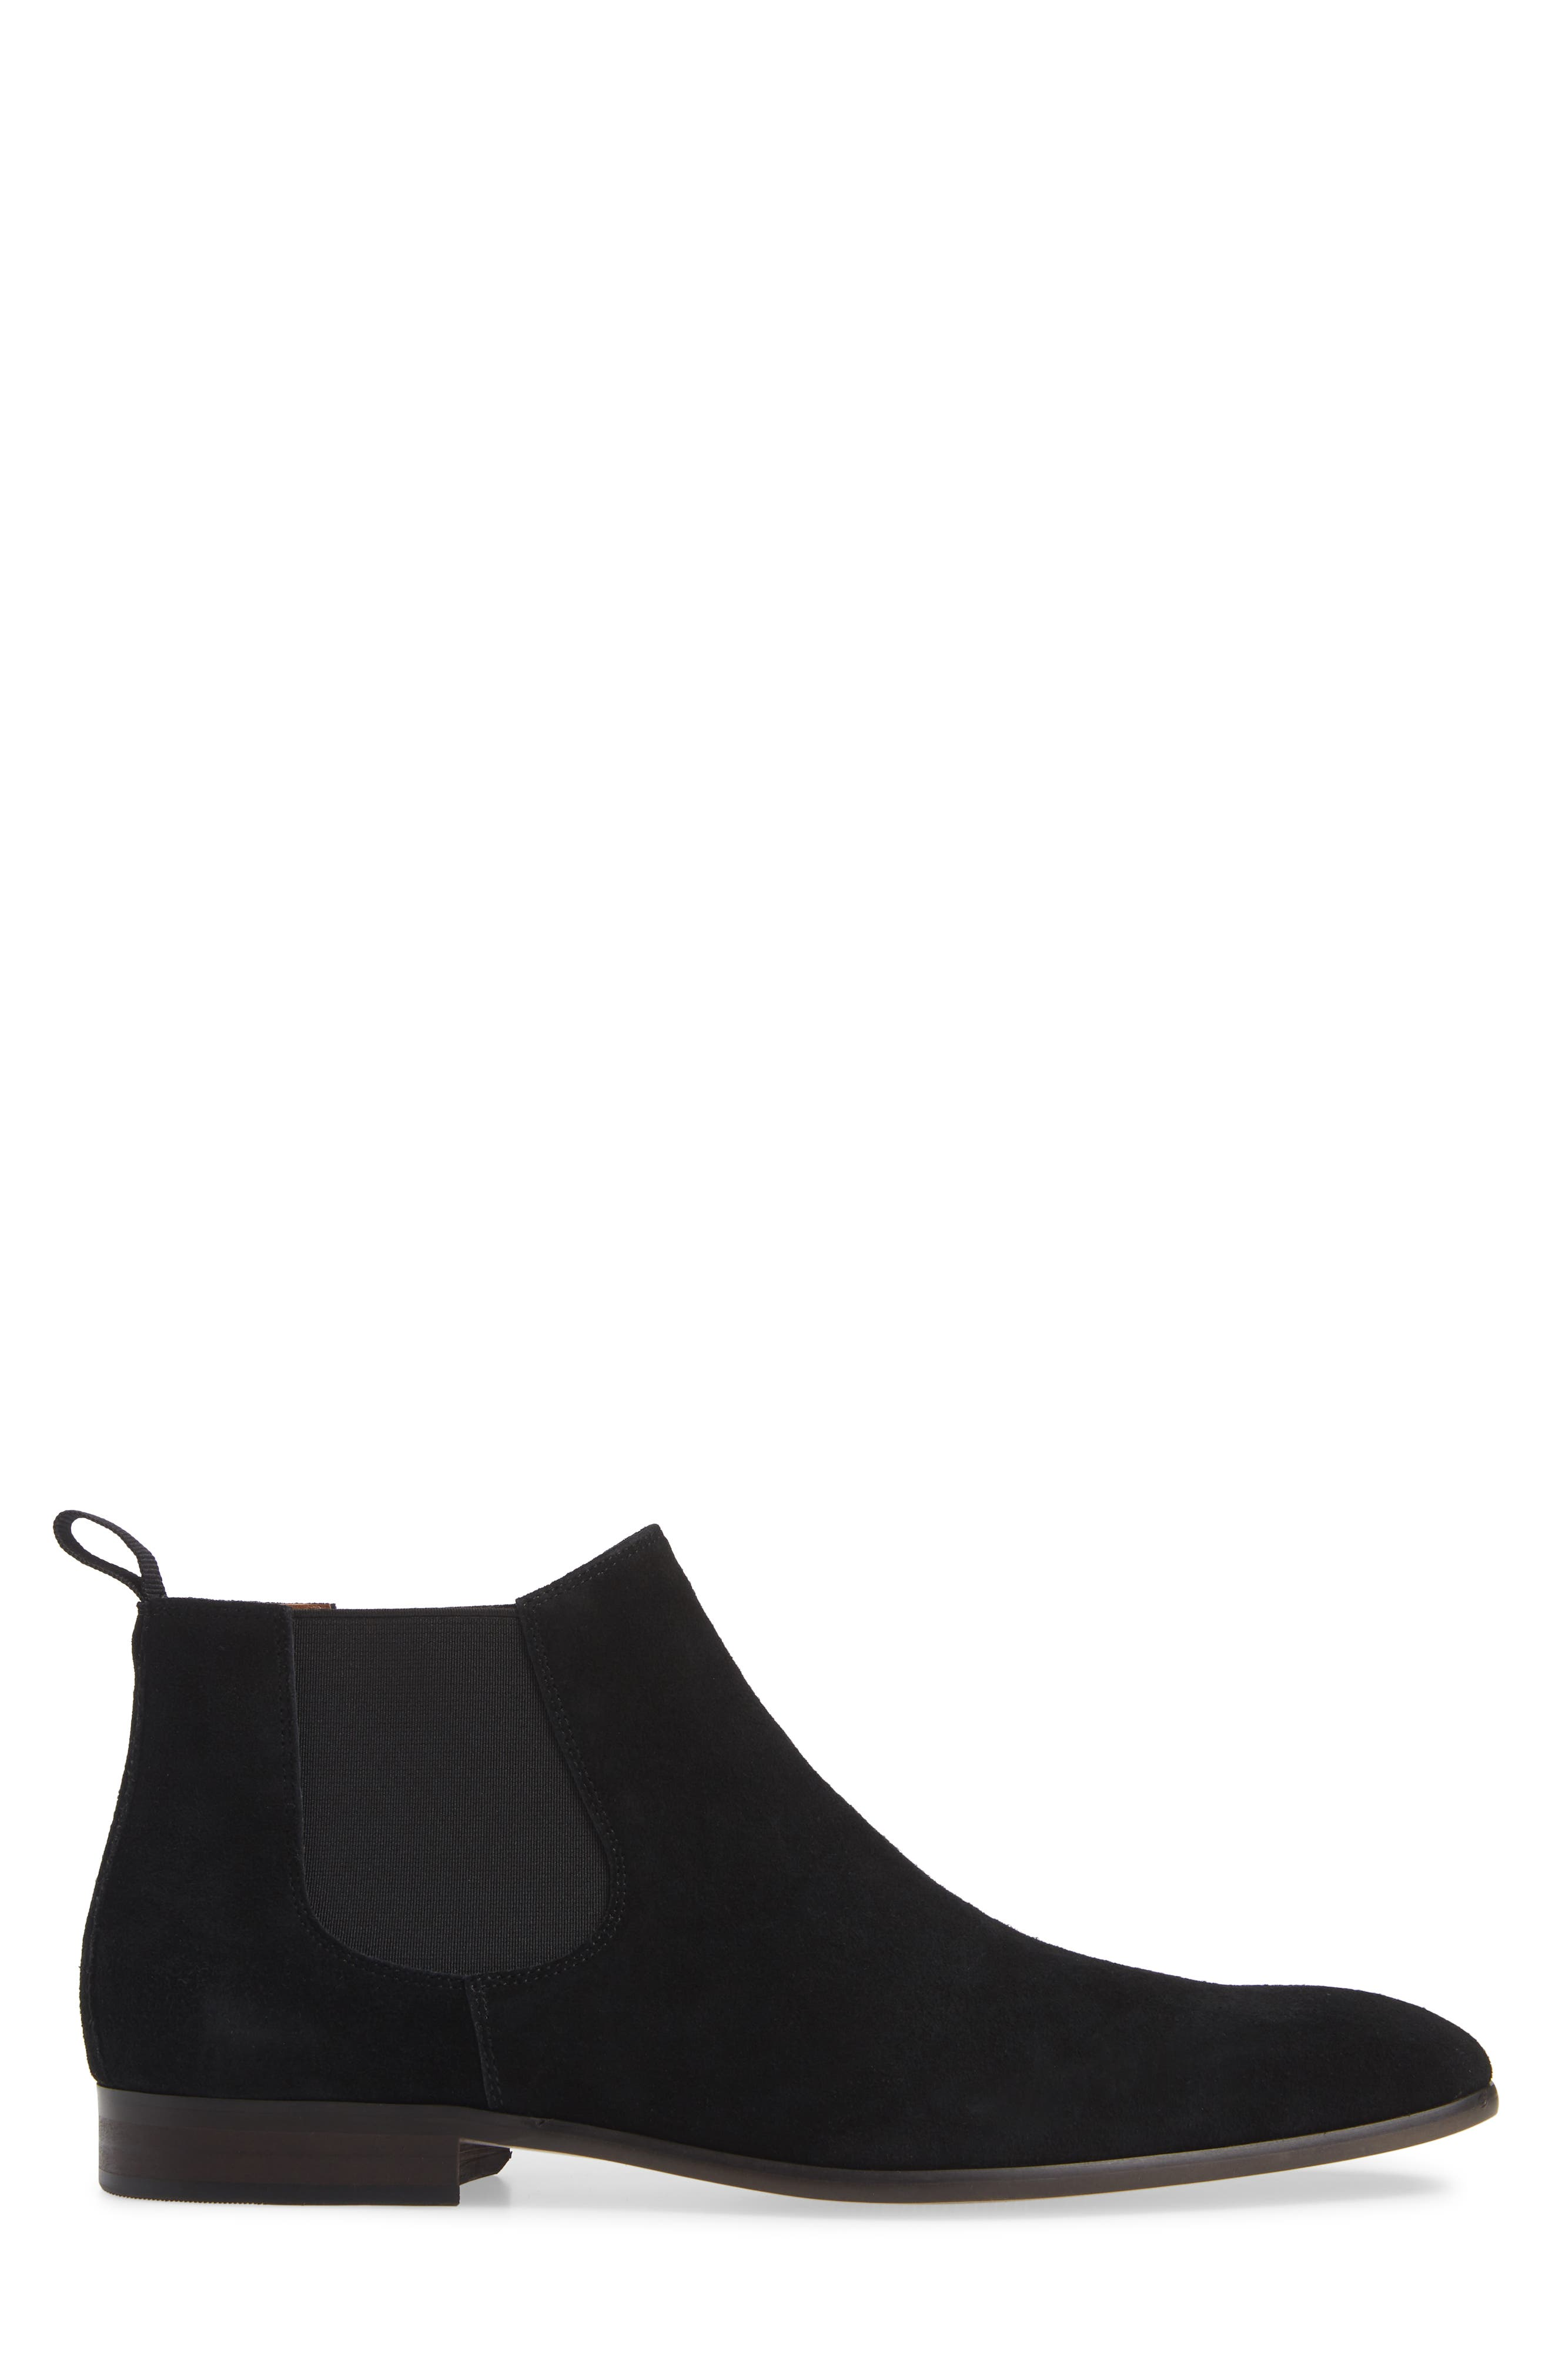 Edward Chelsea Boot,                             Alternate thumbnail 3, color,                             BLACK SUEDE